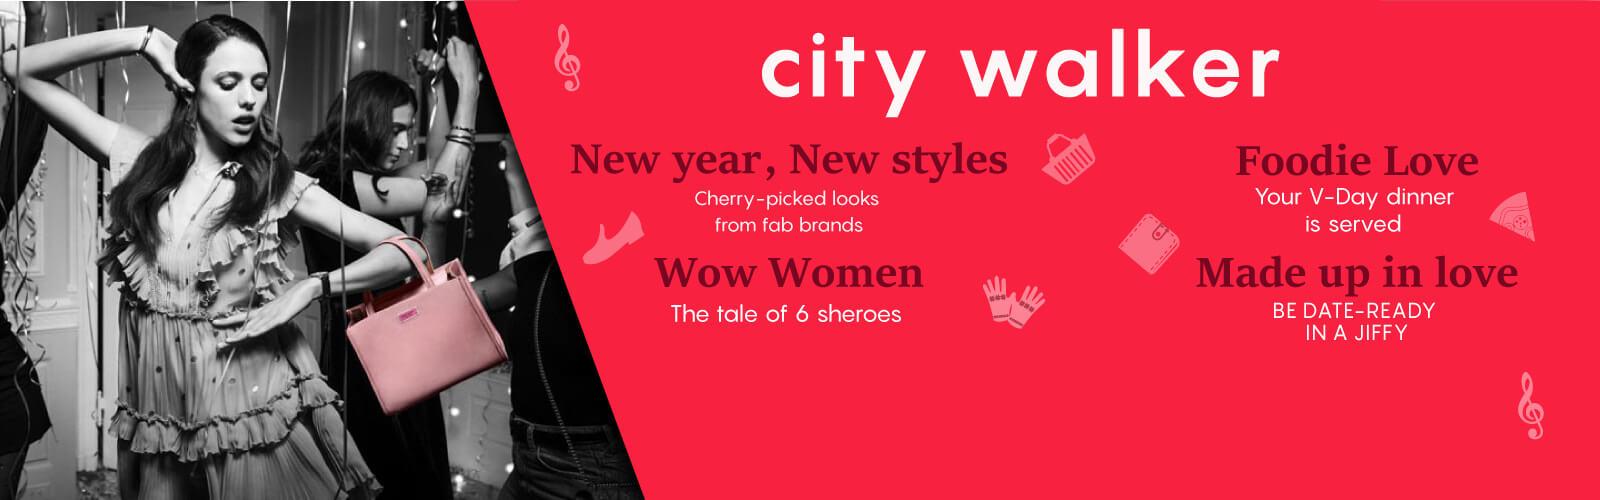 city-walker-banner